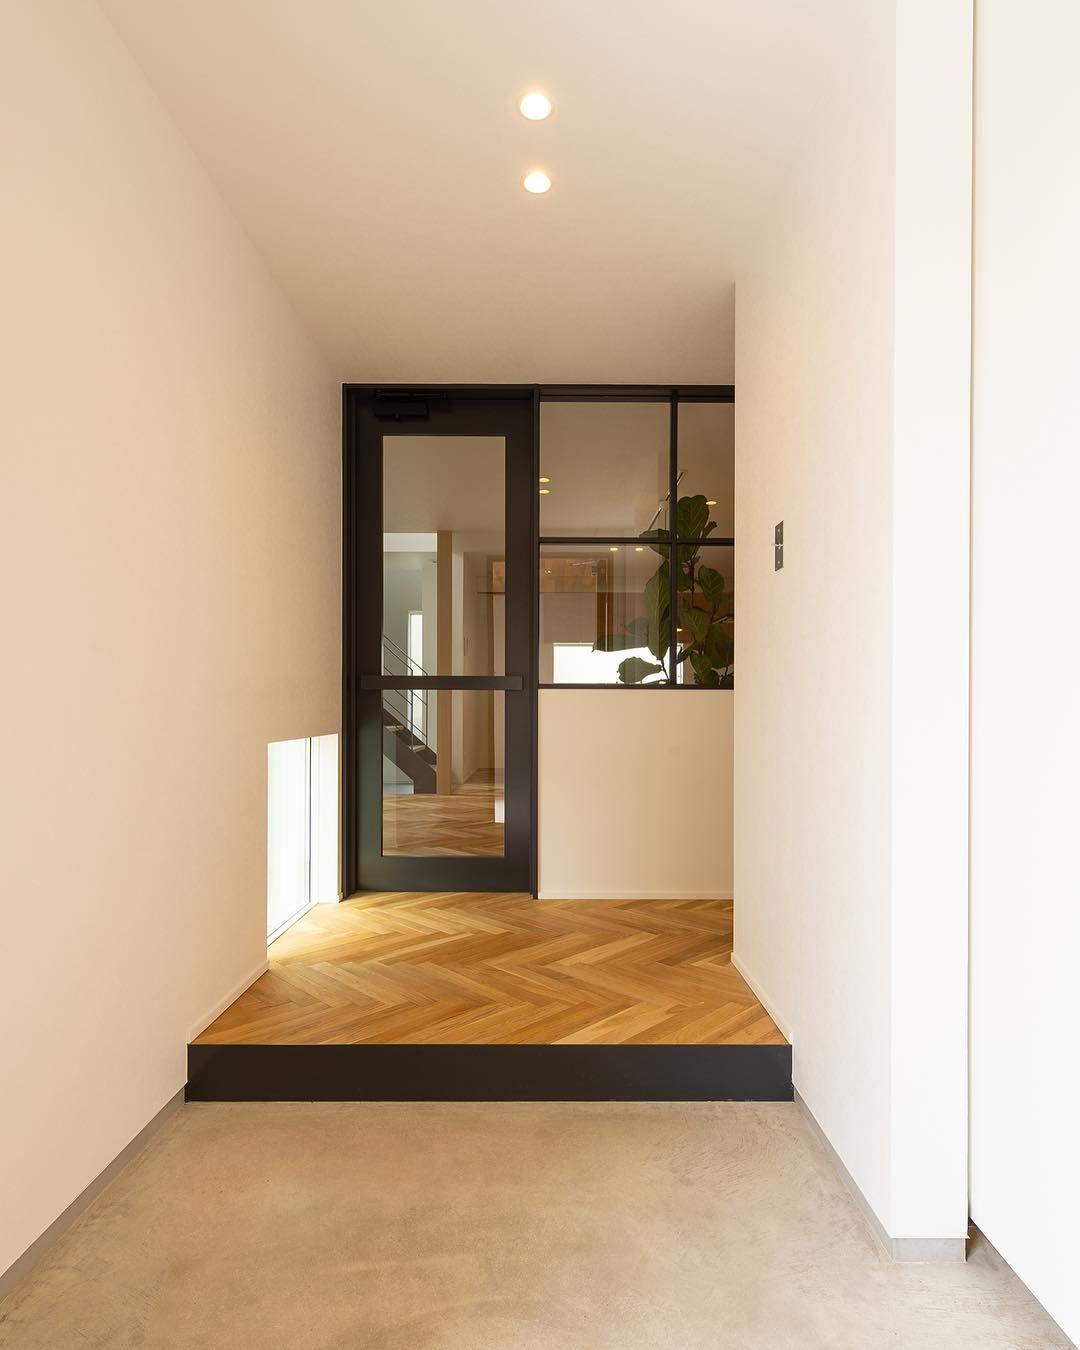 home おしゃれまとめの人気アイデア pinterest patrizia catalani 家のインテリア 家 玄関ホール デザイン